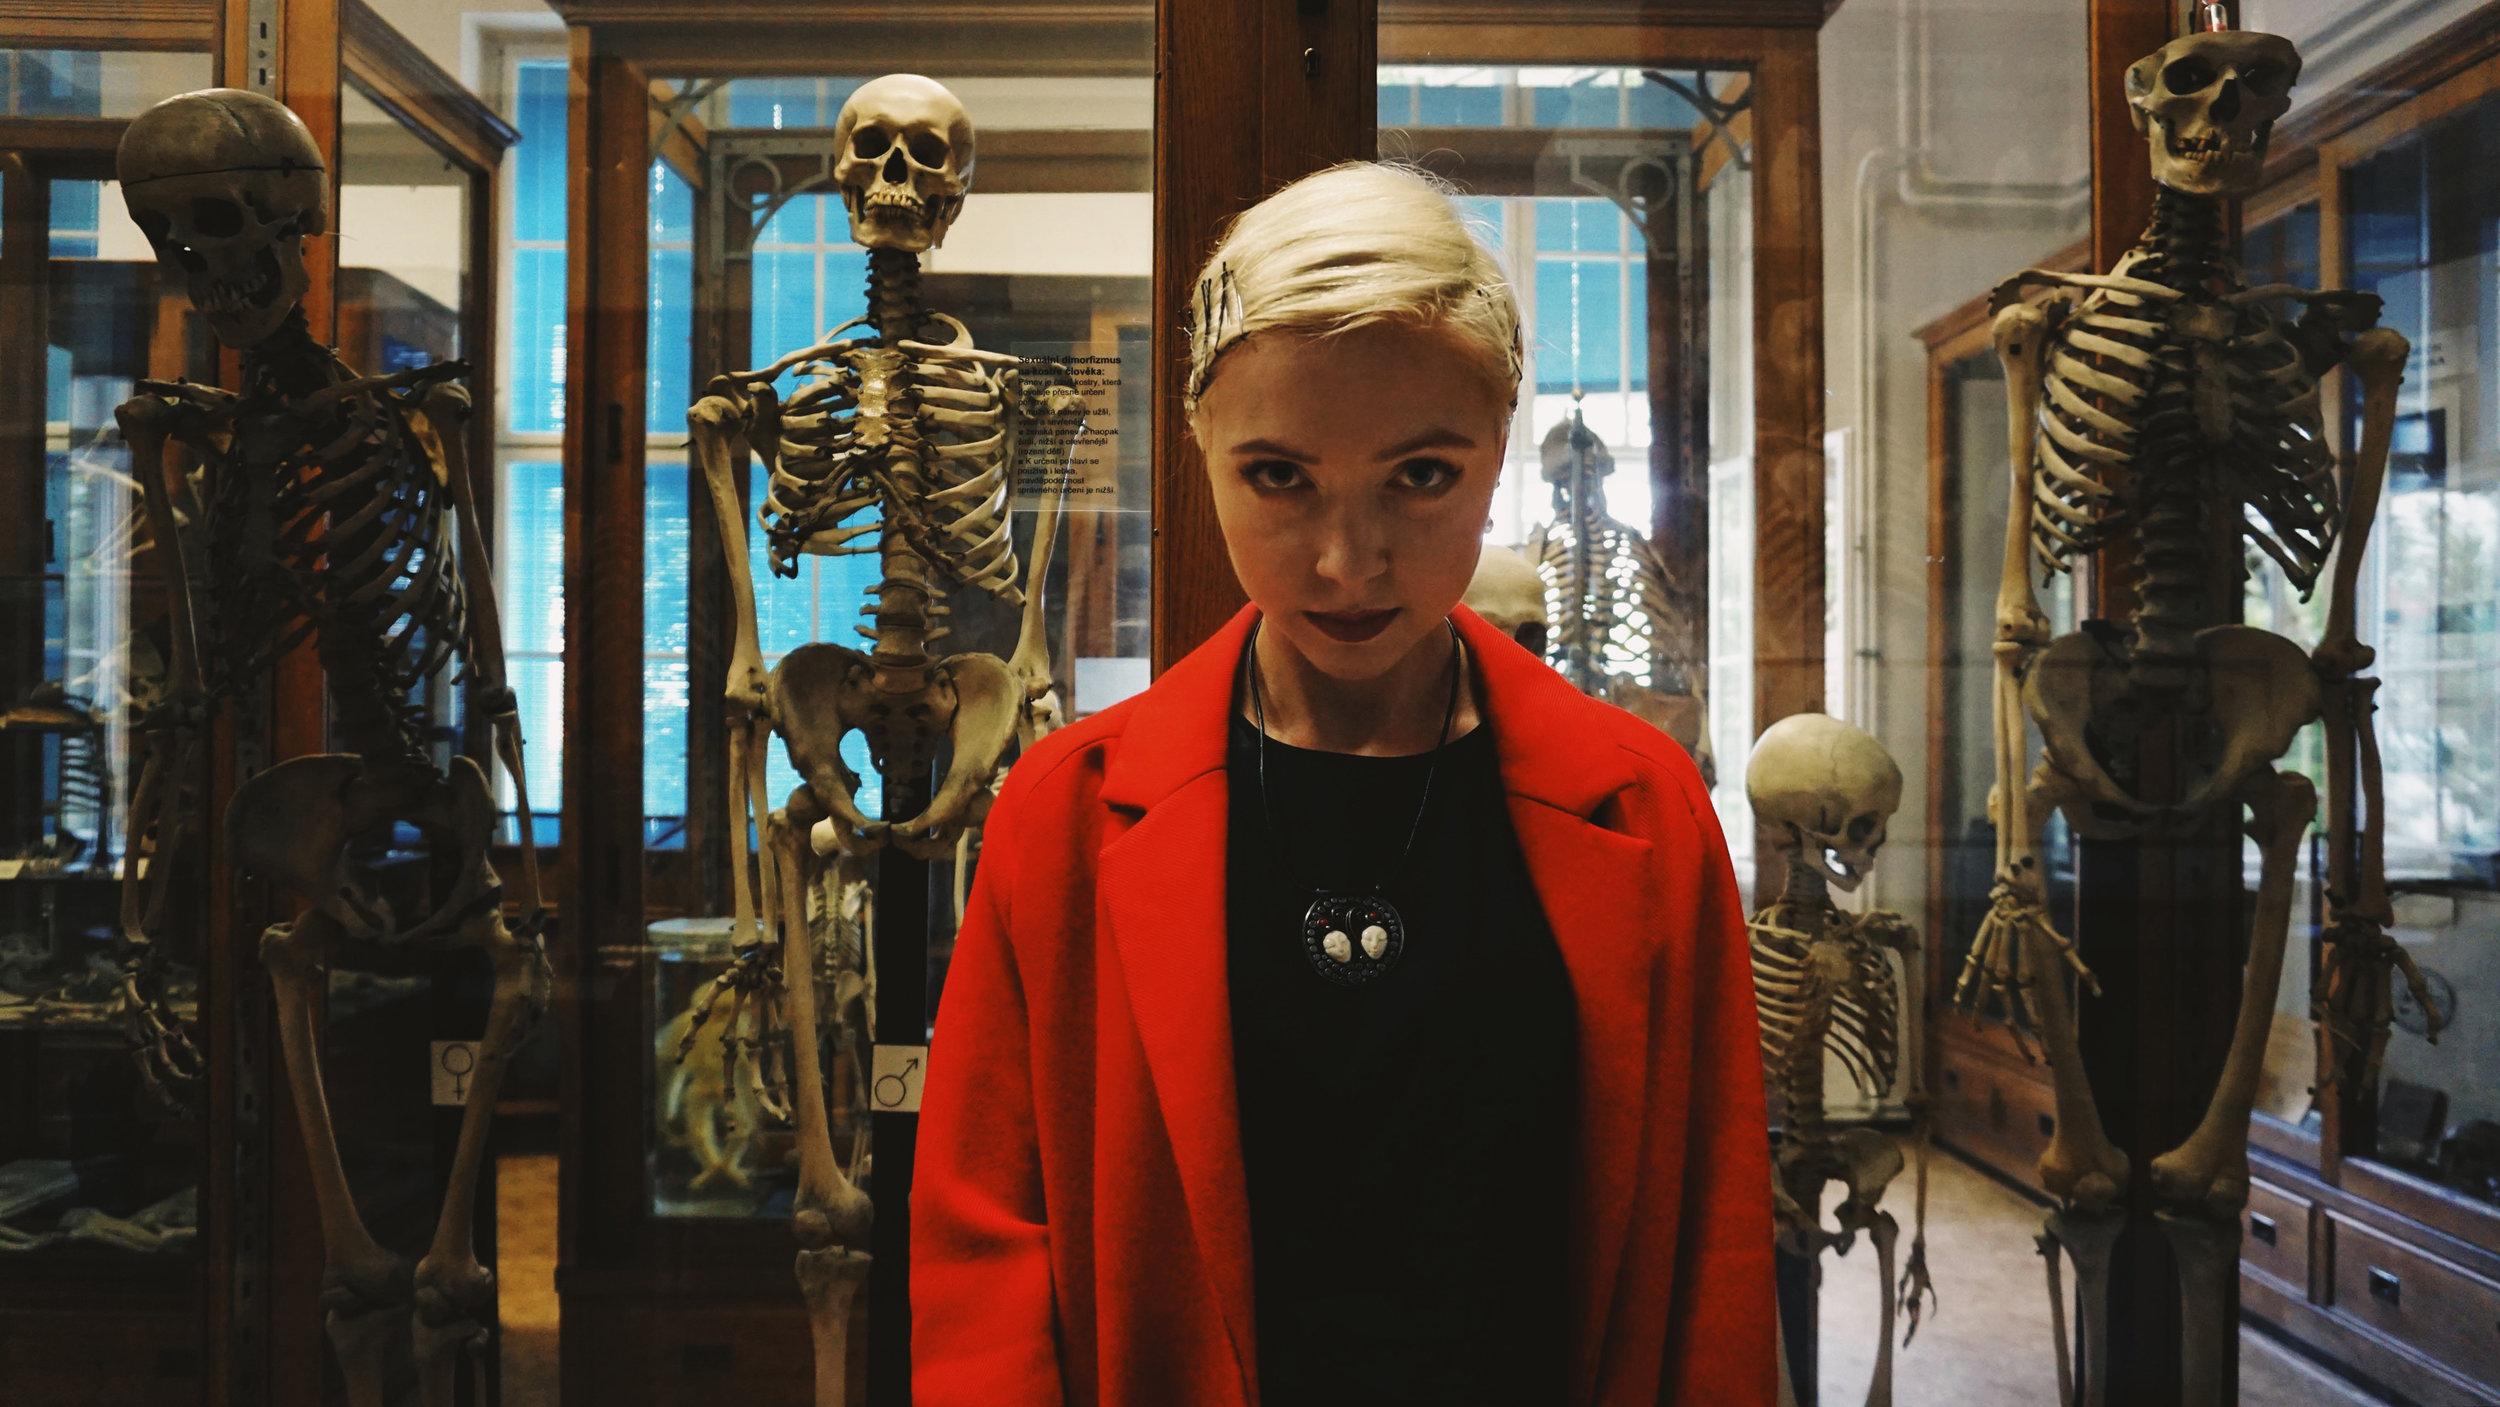 2018-Polina-Shubkina-Anastasia-Lagutina-Prague-Vampire-014.JPG